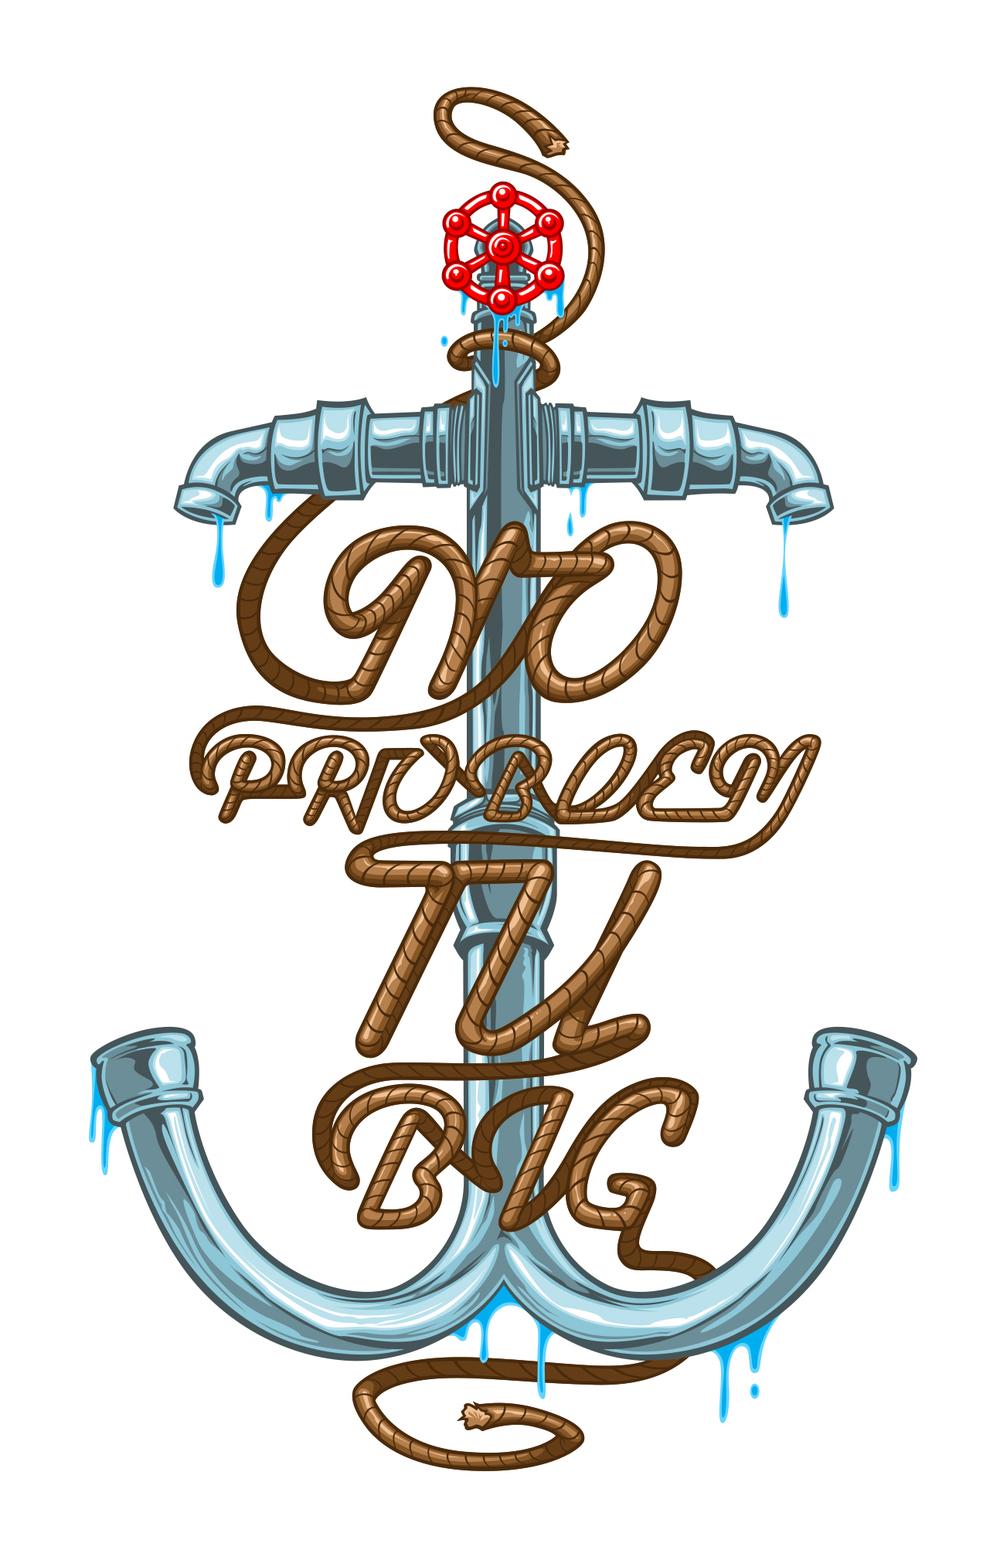 ...no problem TU big...